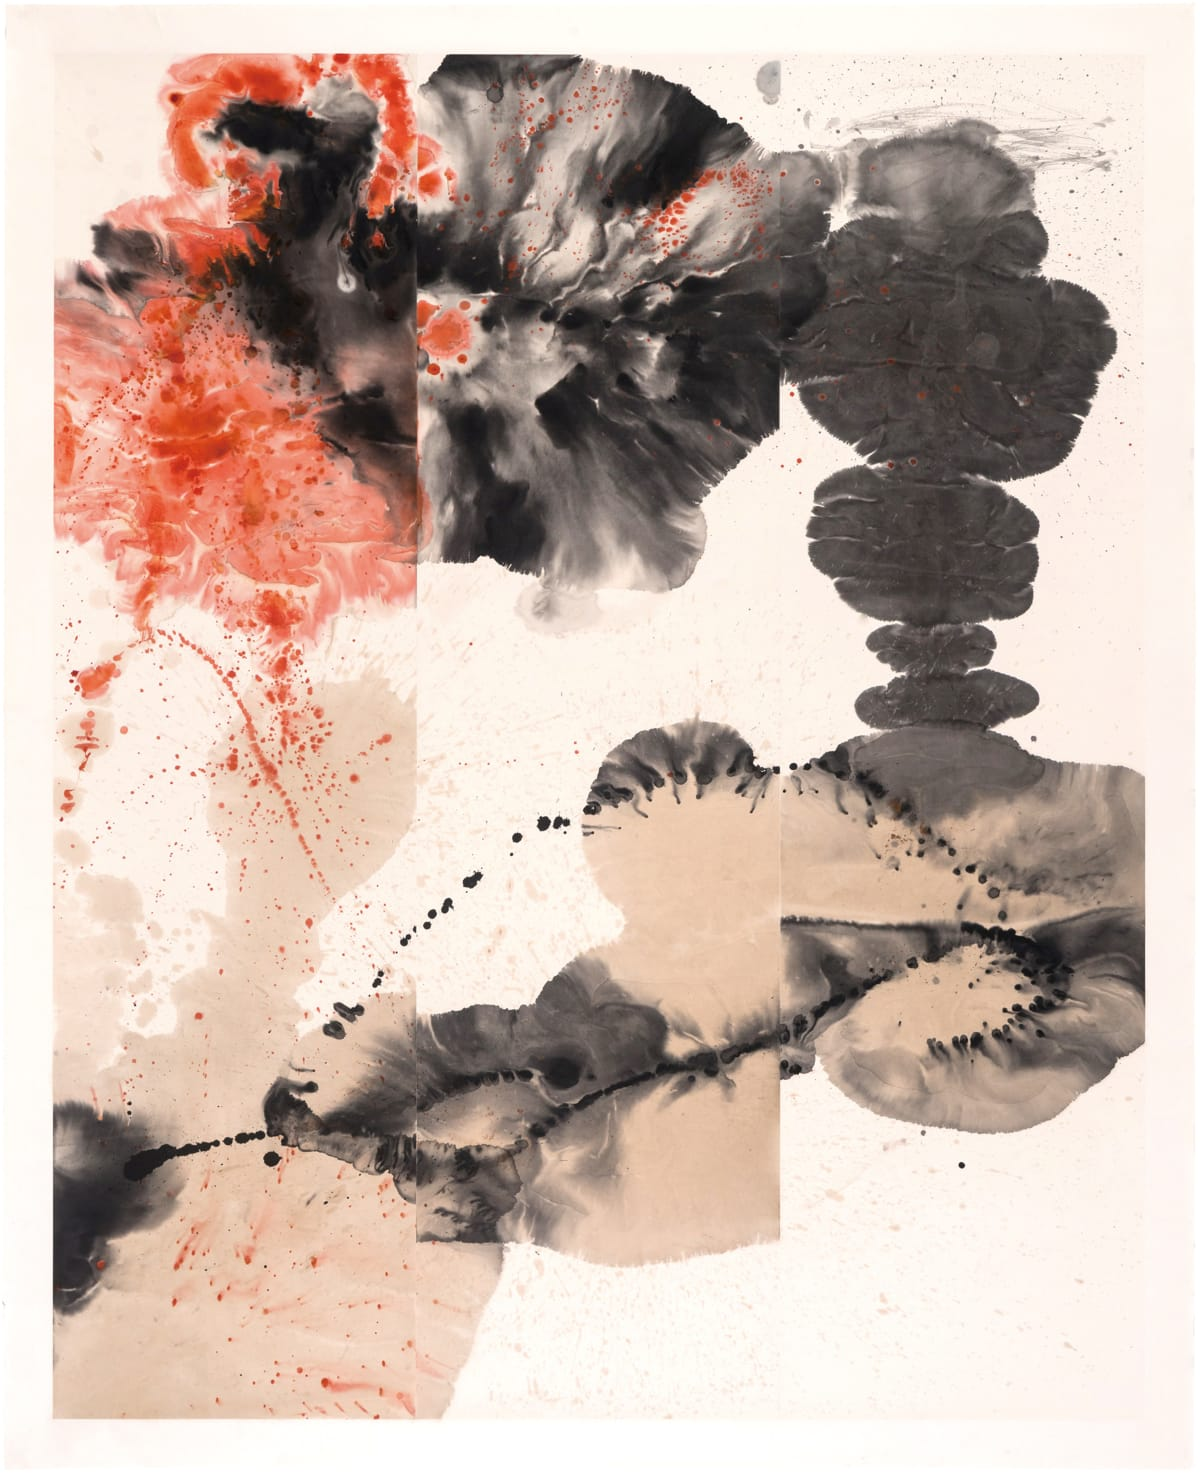 Chloe Ho 何鳳蓮, Perfect Union Triptych, 2013